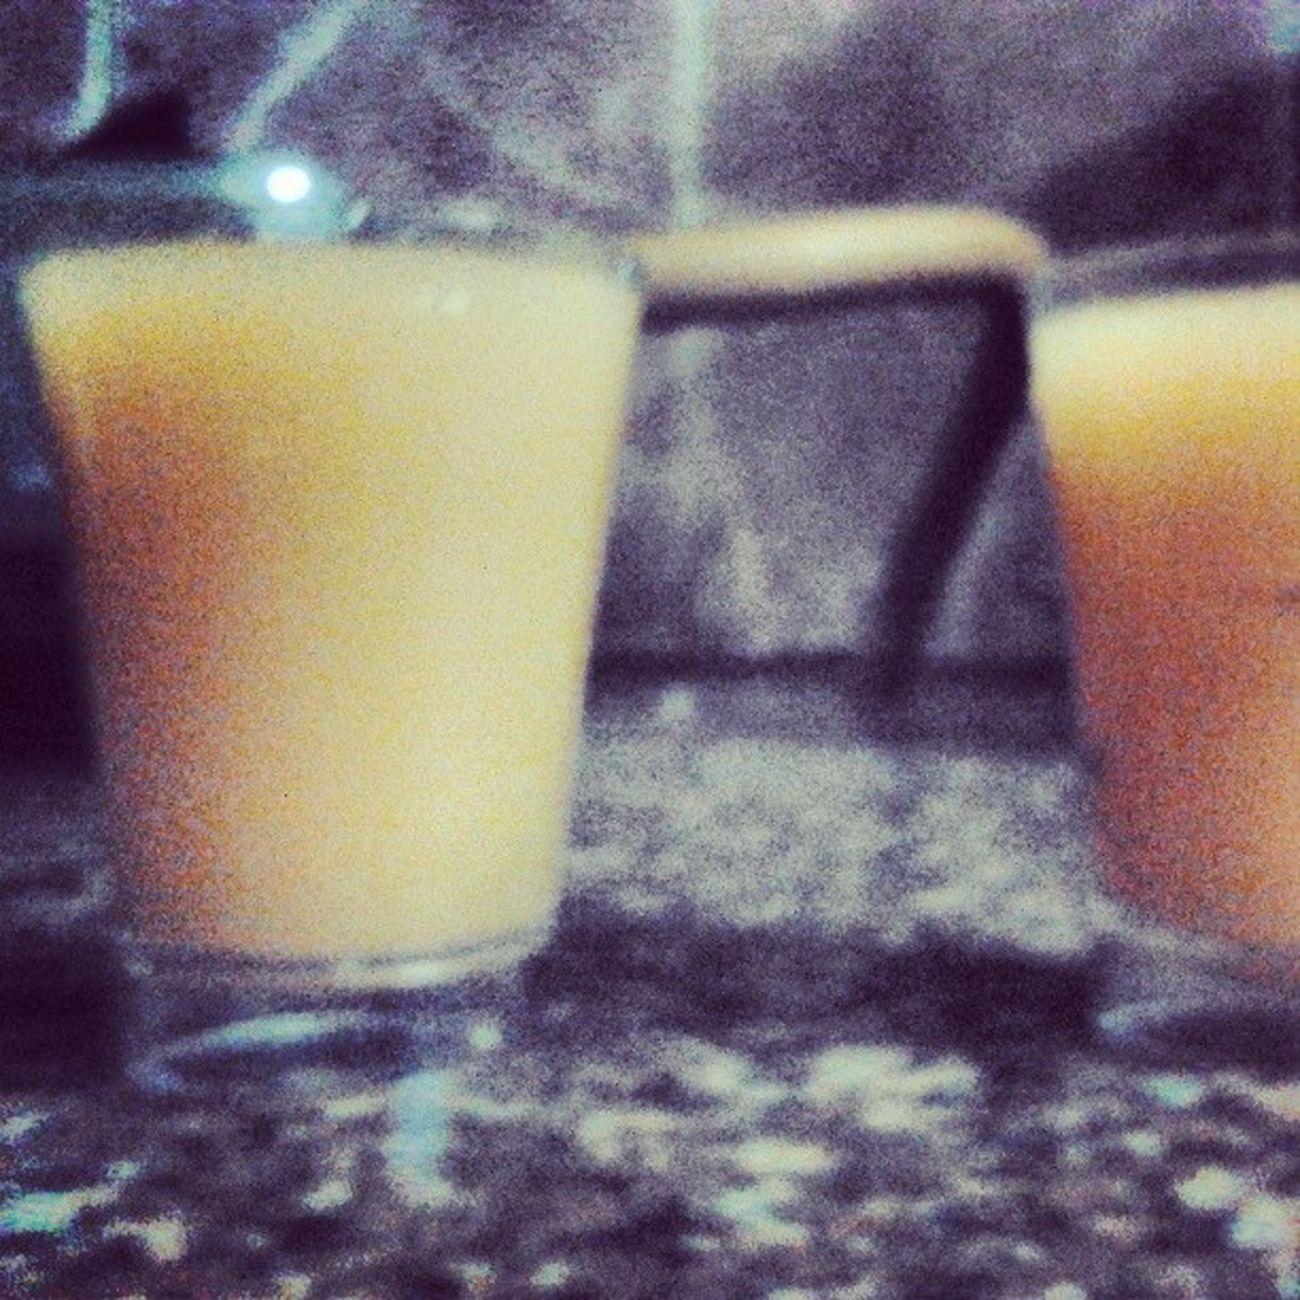 ShotglassesShots Juice Poorme Notsohappynwyr beemArmeboredinstaboredpagalbangyahun